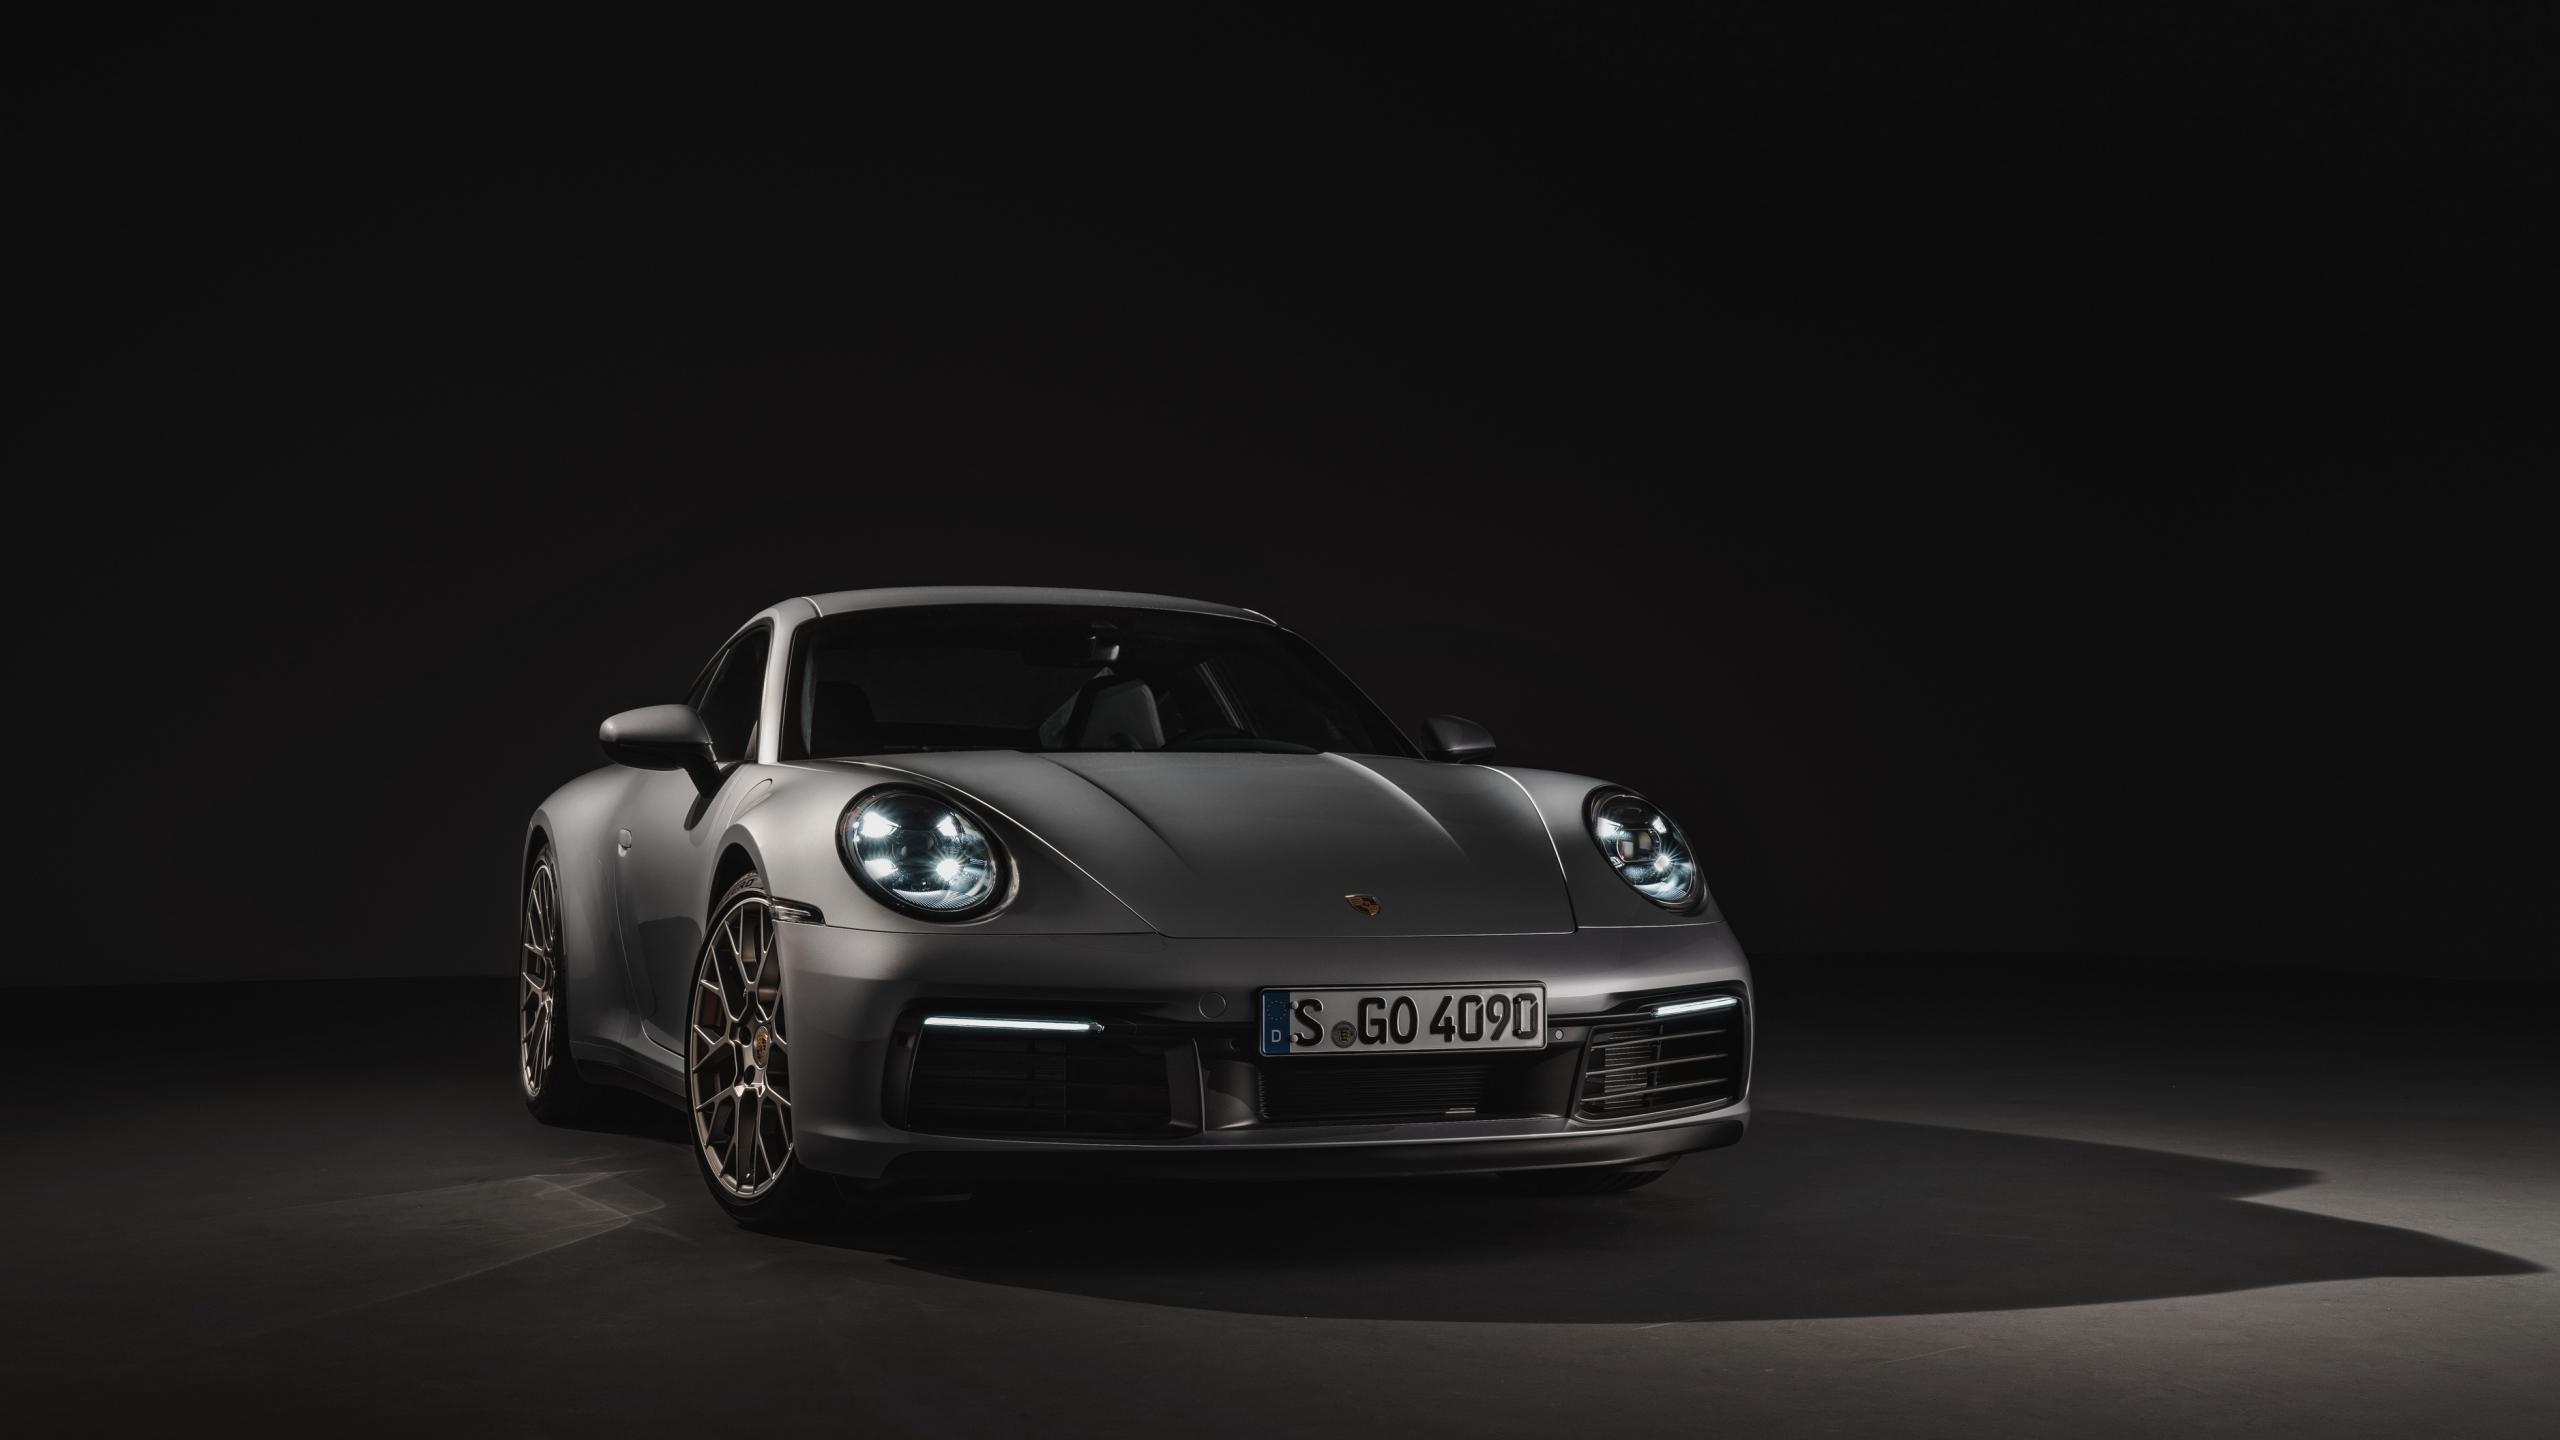 Download 2560x1440 Wallpaper Silver Sports Car Porsche 911 Carrera Dual Wide Widescreen 16 9 Widescreen 2560x1440 Hd Image Background 16512